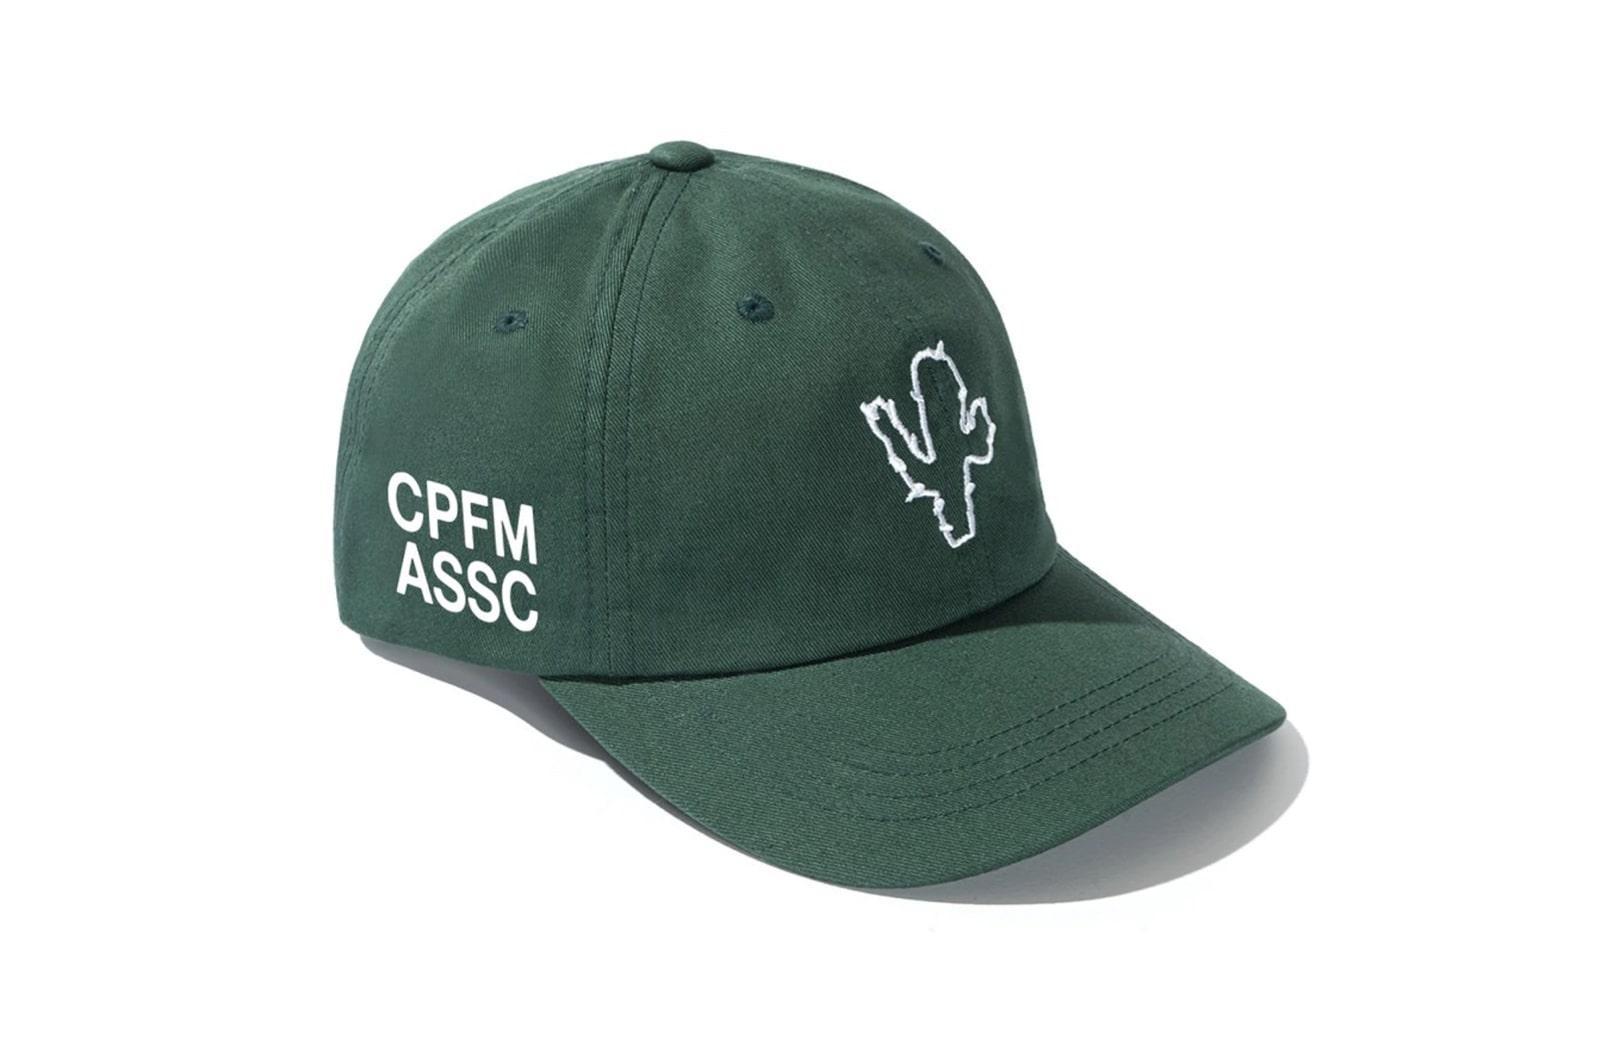 slide 1 - Green CPFM Cap